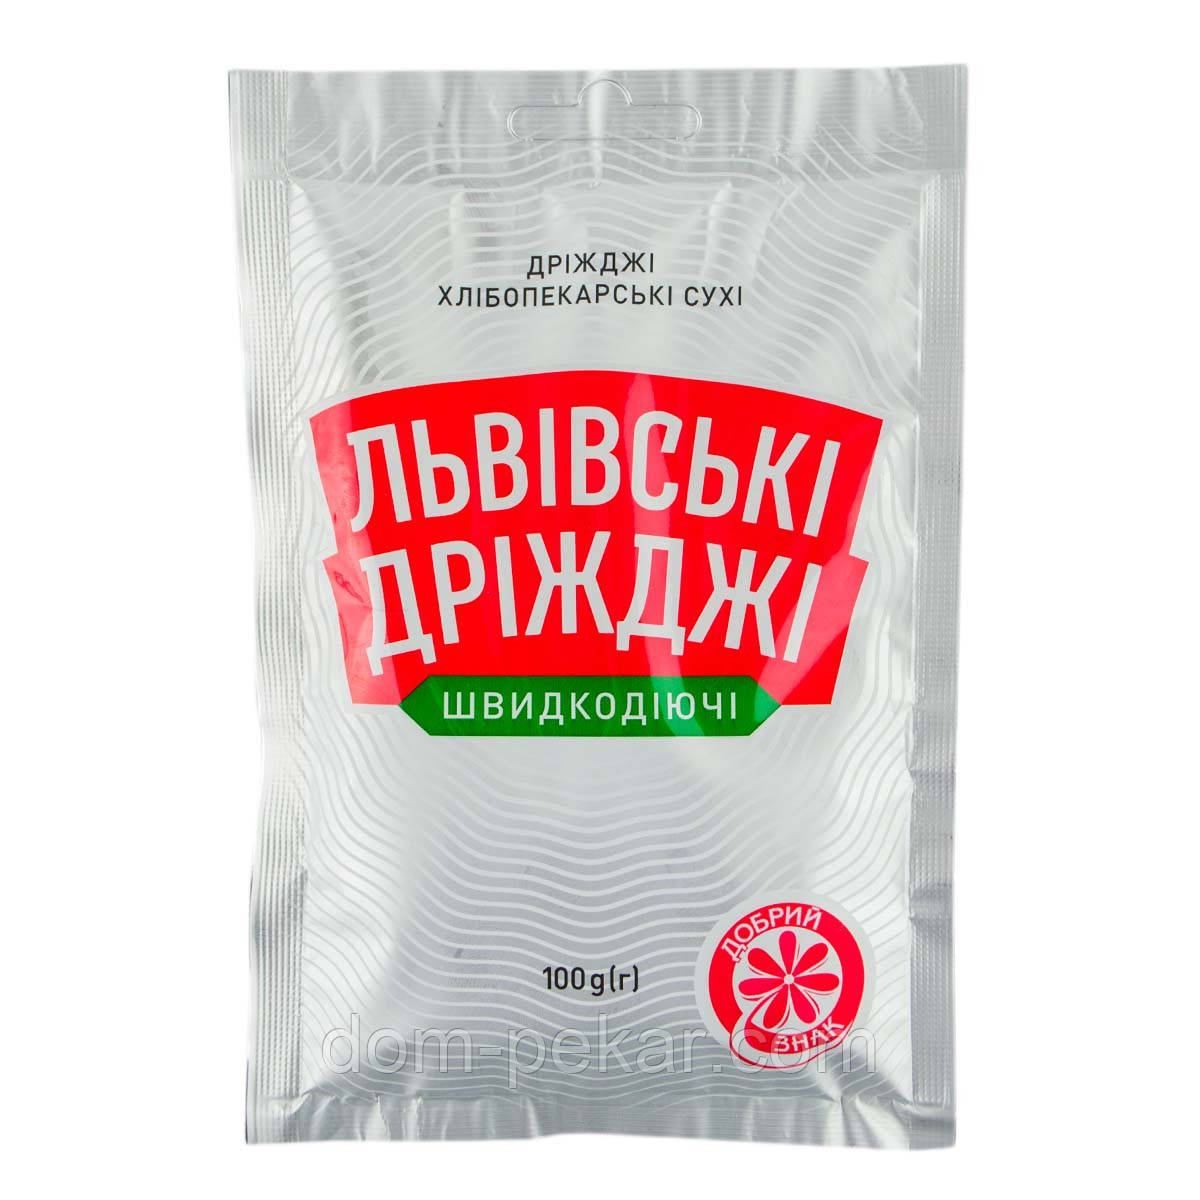 Дрожжи сухие (Львовские 100 гр)